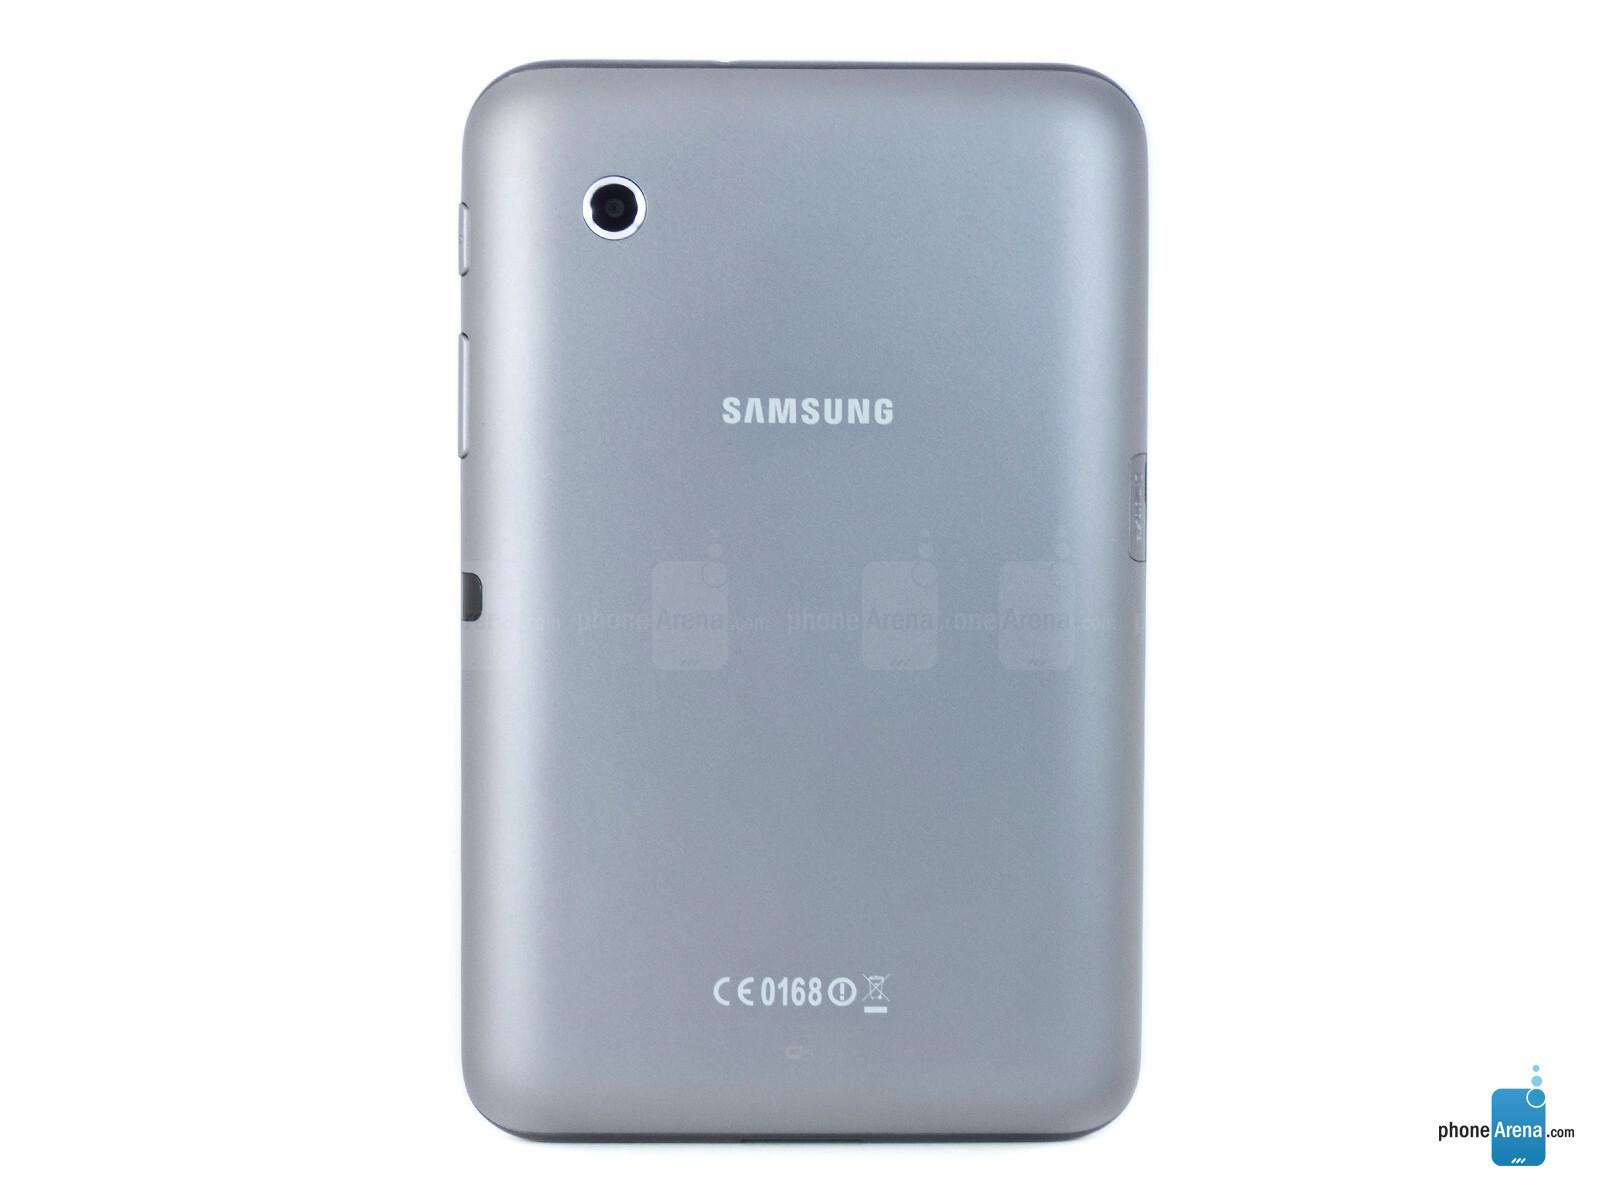 Samsung GALAXY Tab 2 (7.0) specs